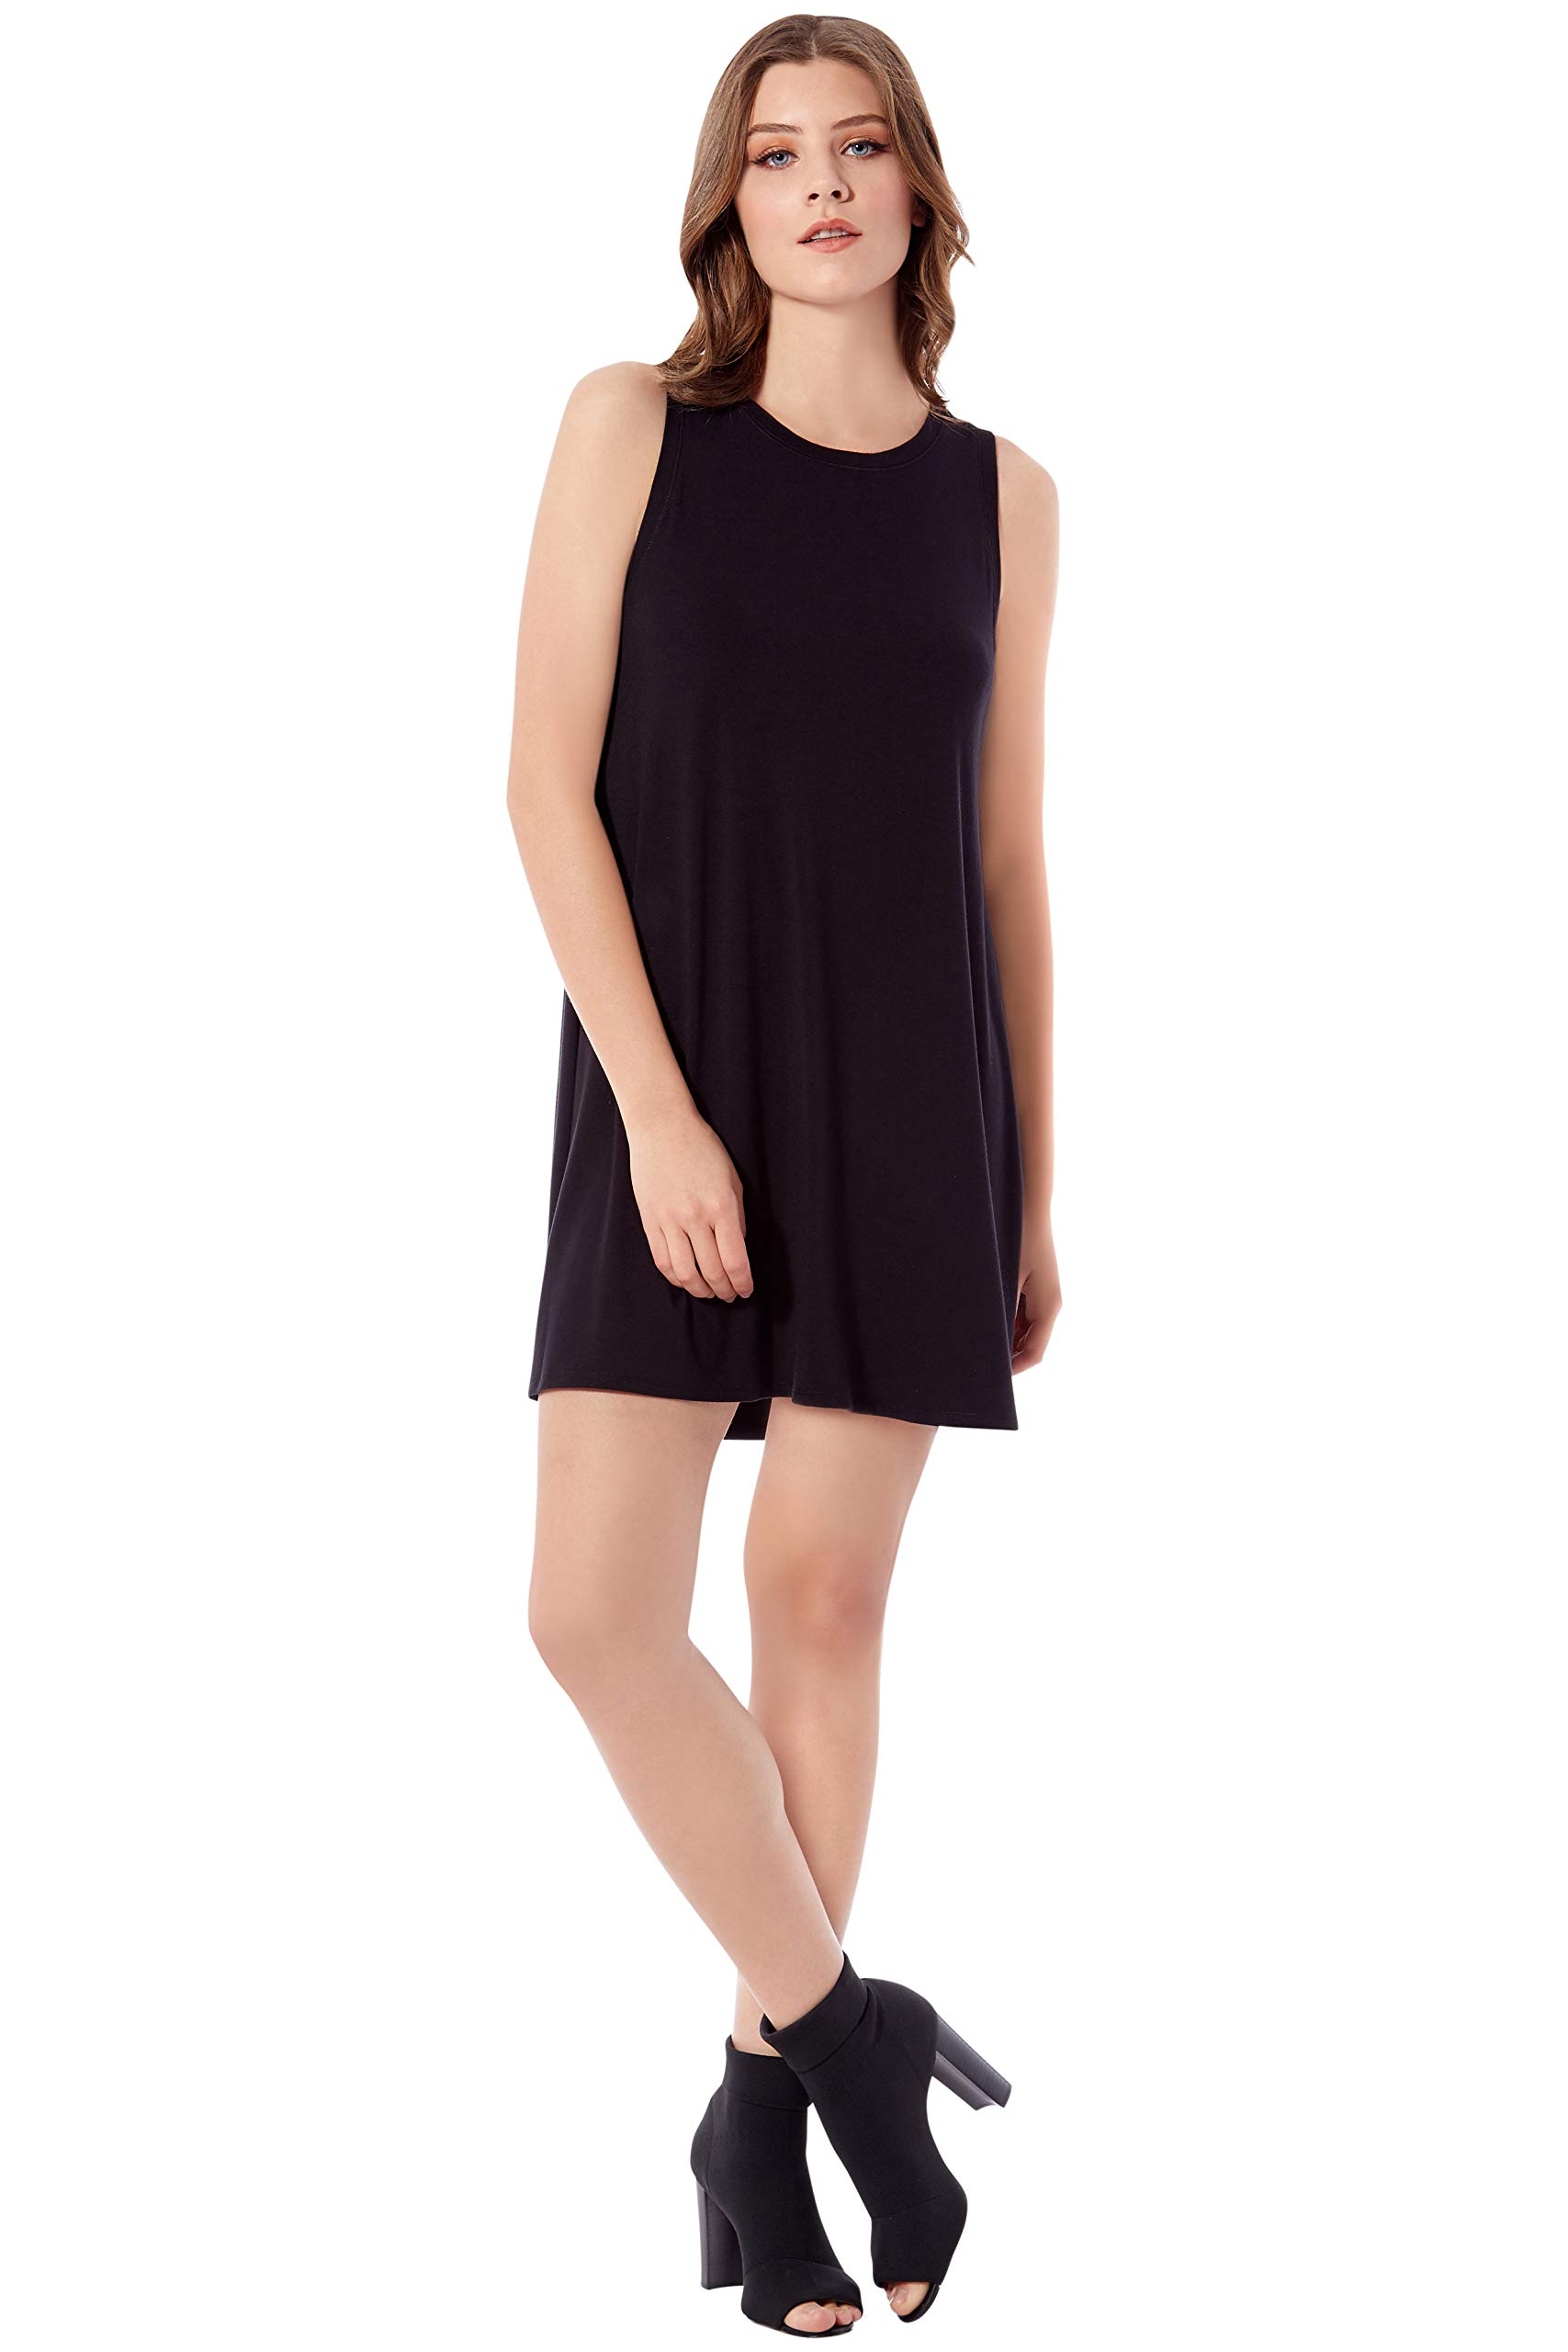 Rohb by Joyce Azria Seville Sleeveless Mini Swing Dress (Black) Size S